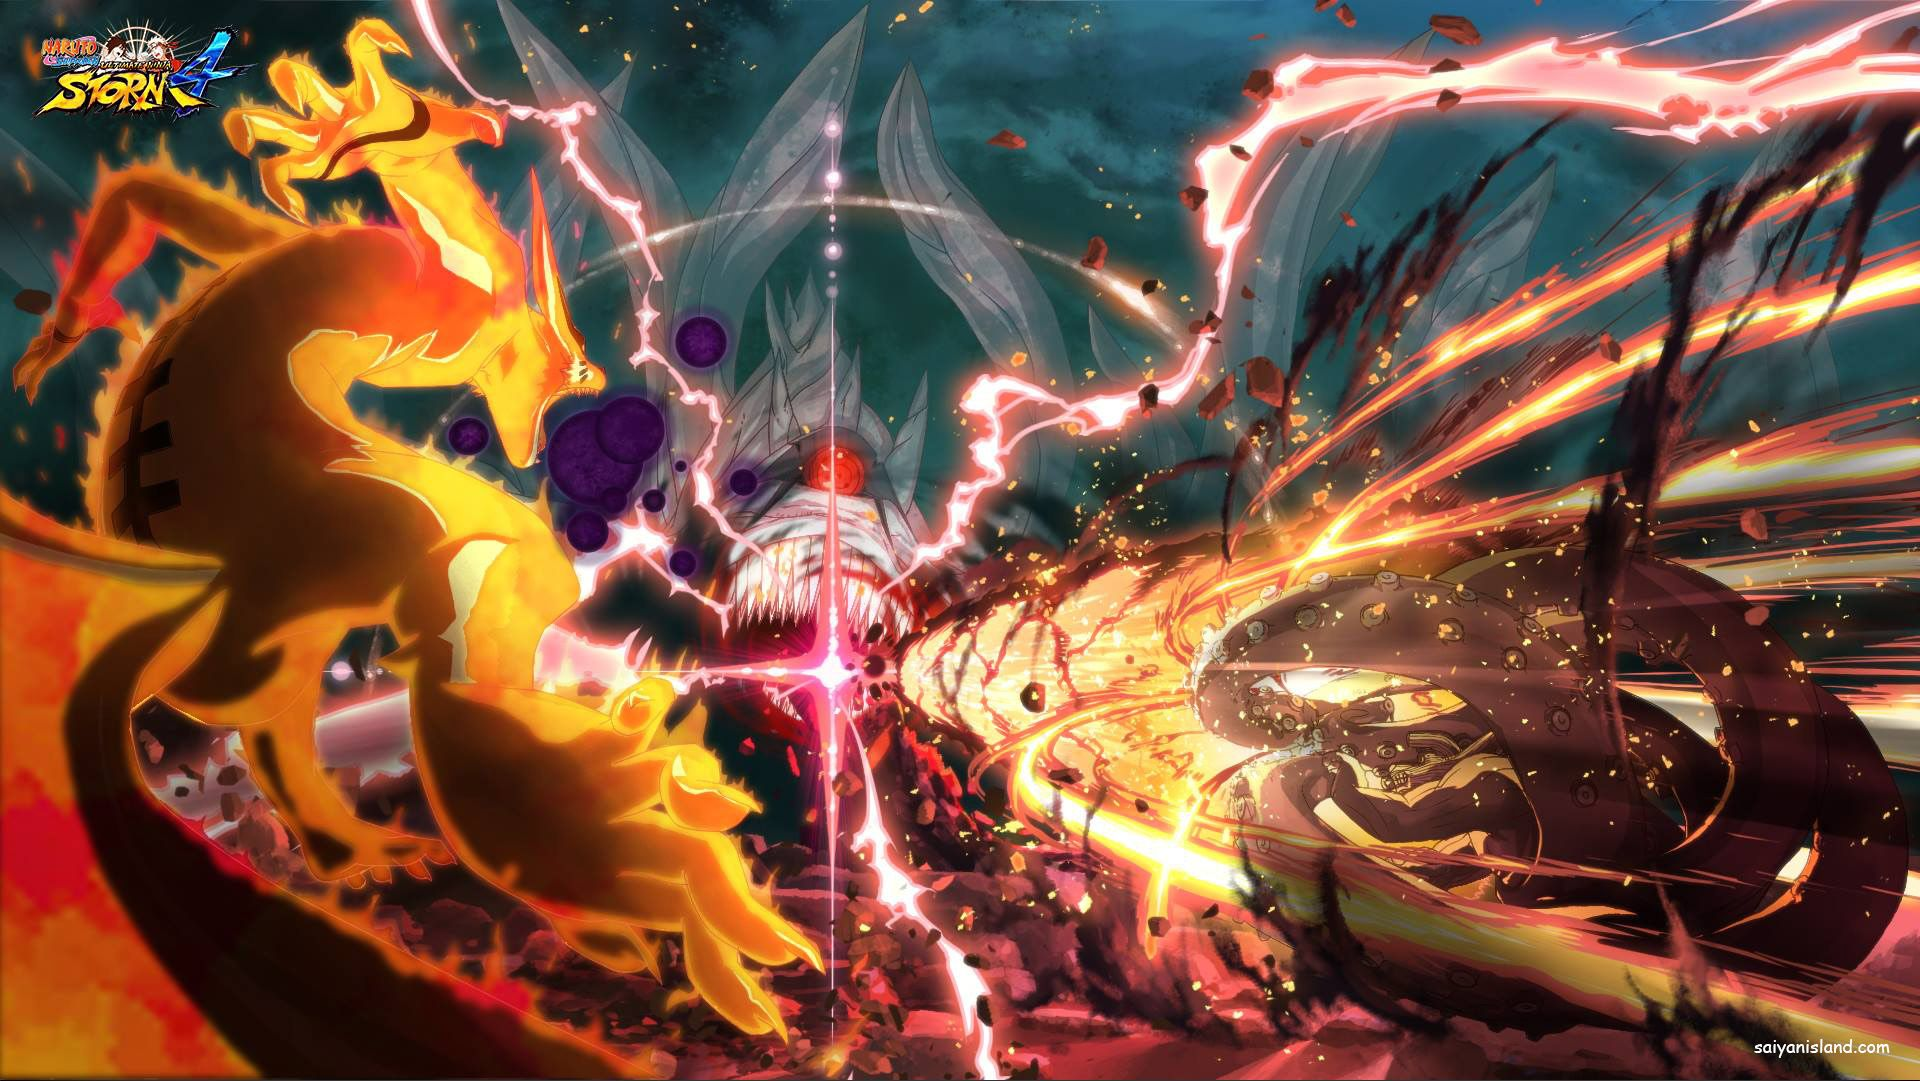 Naruto Storm 4 Eight Nine Tails Vs Ten Tails Art Android Wallpaper Anime Wallpaper Naruto Shippuden Anime Wallpaper